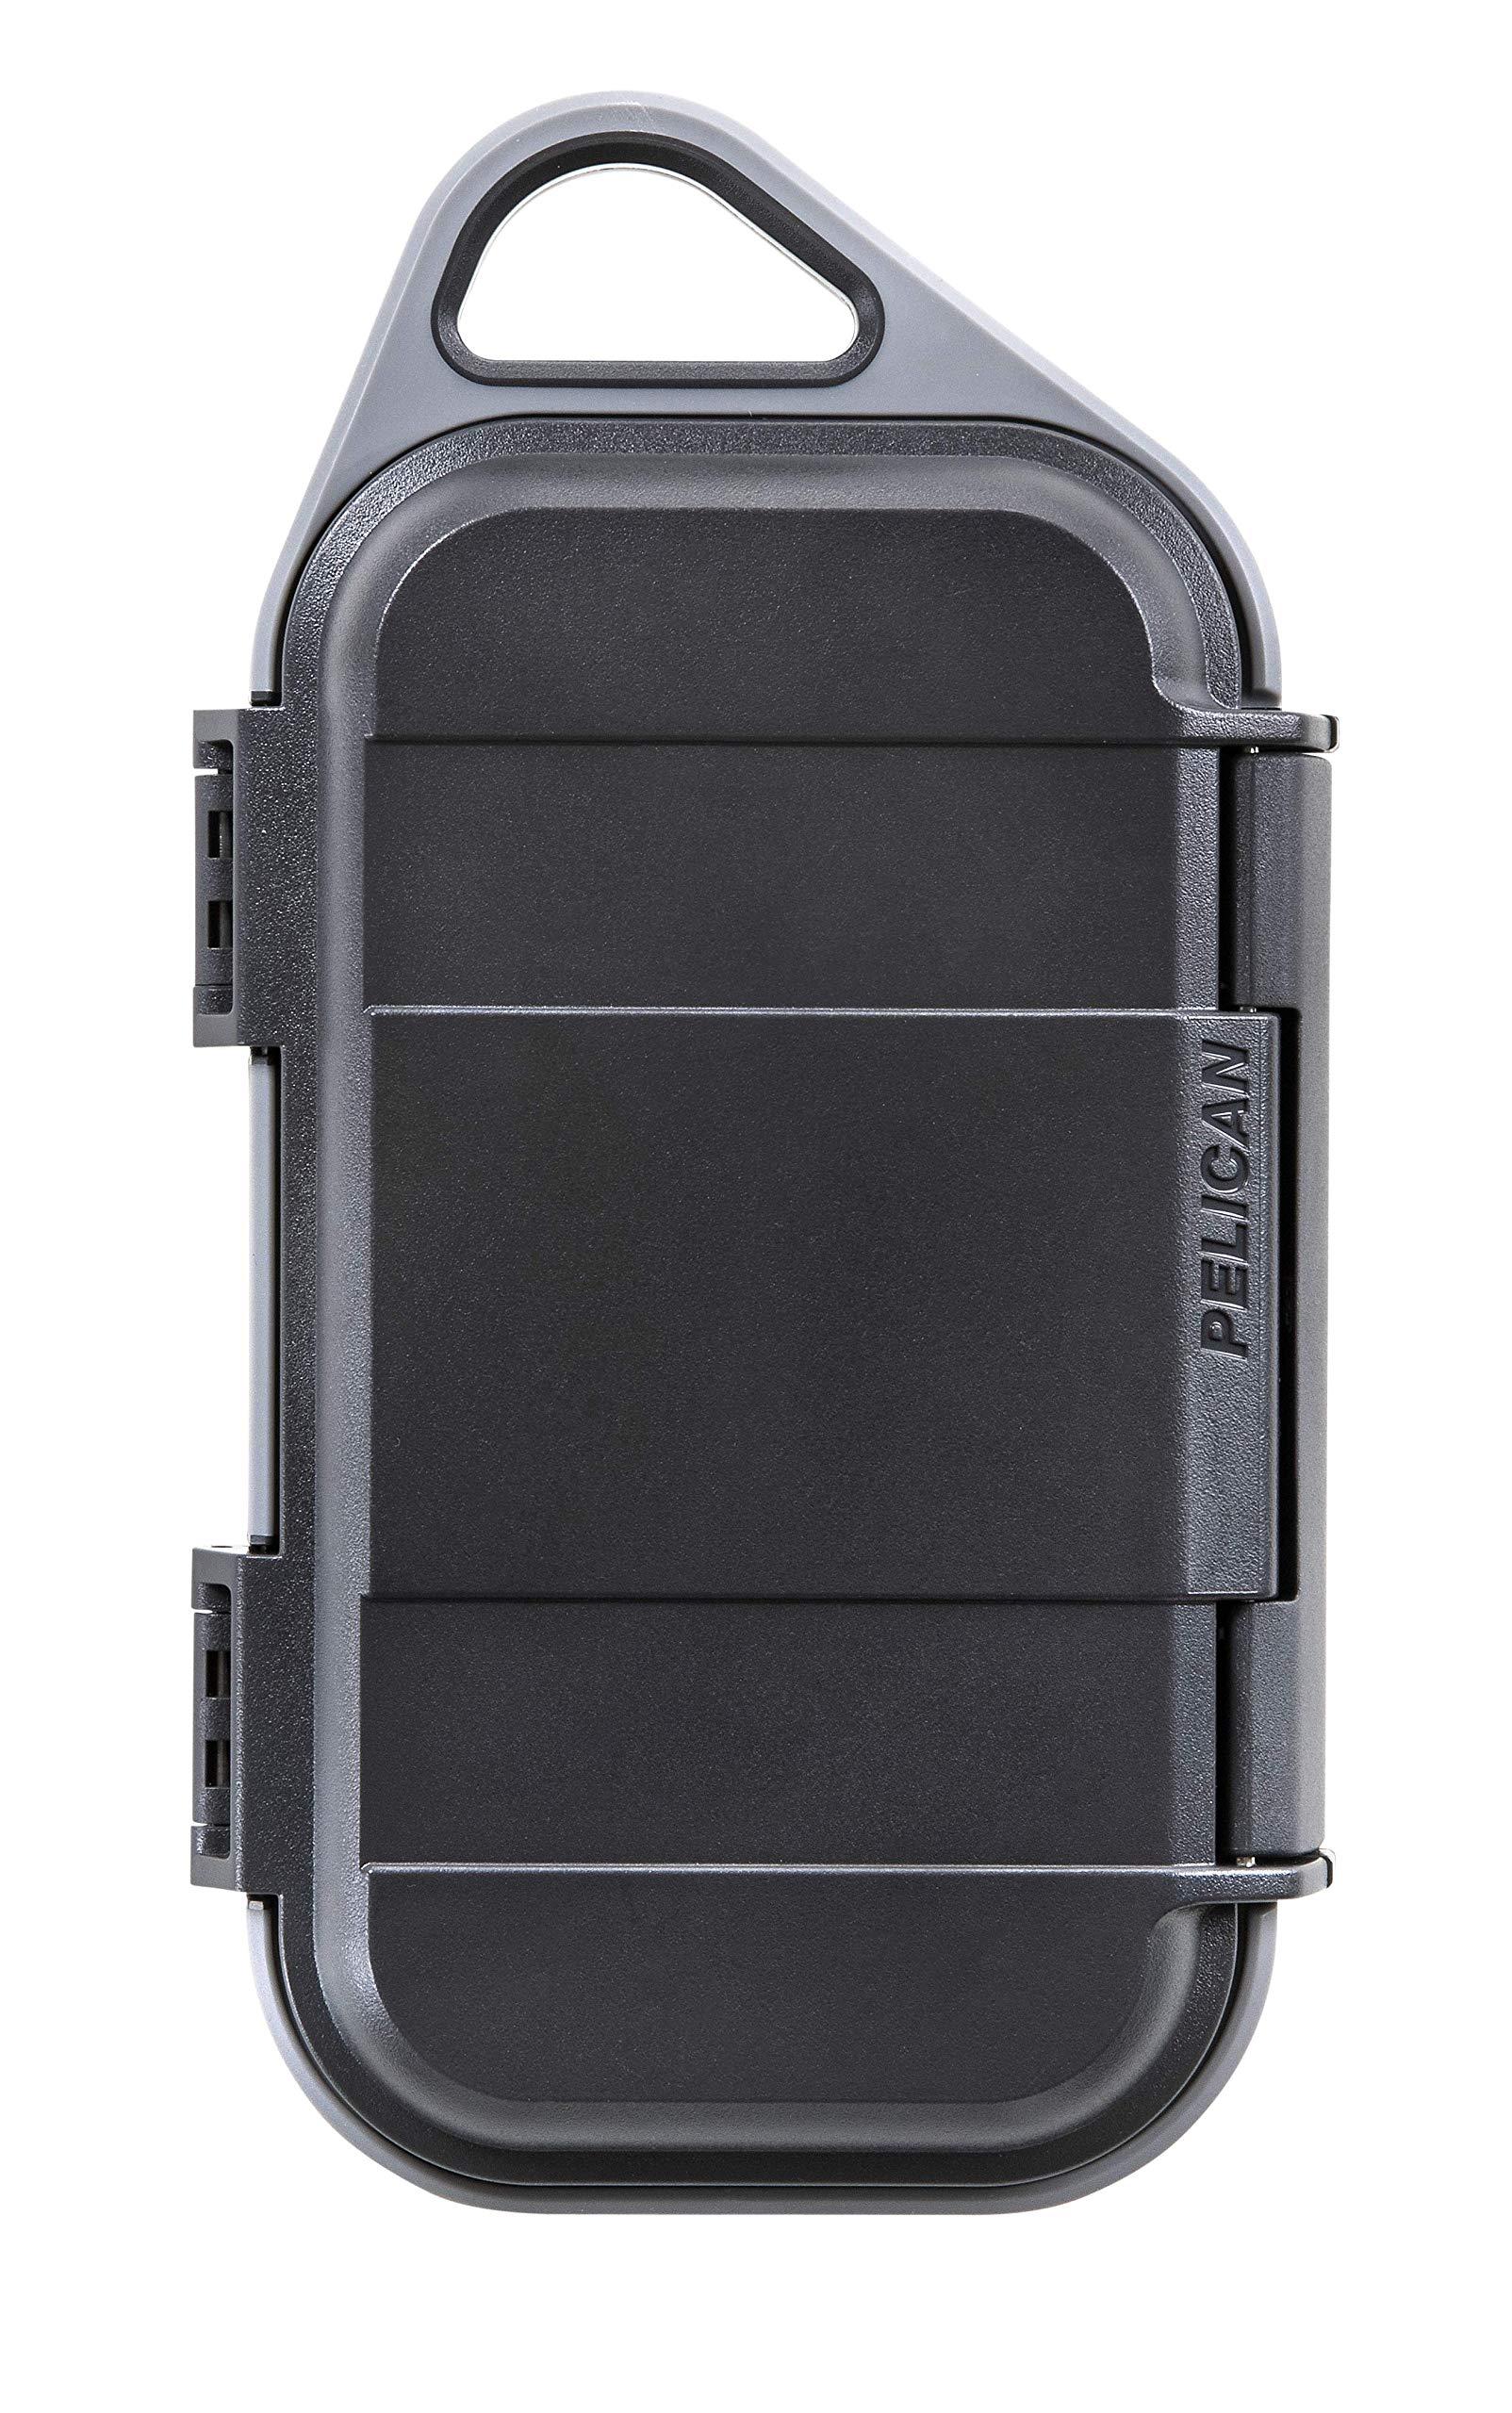 Pelican G40 Case Waterproof Anthracite